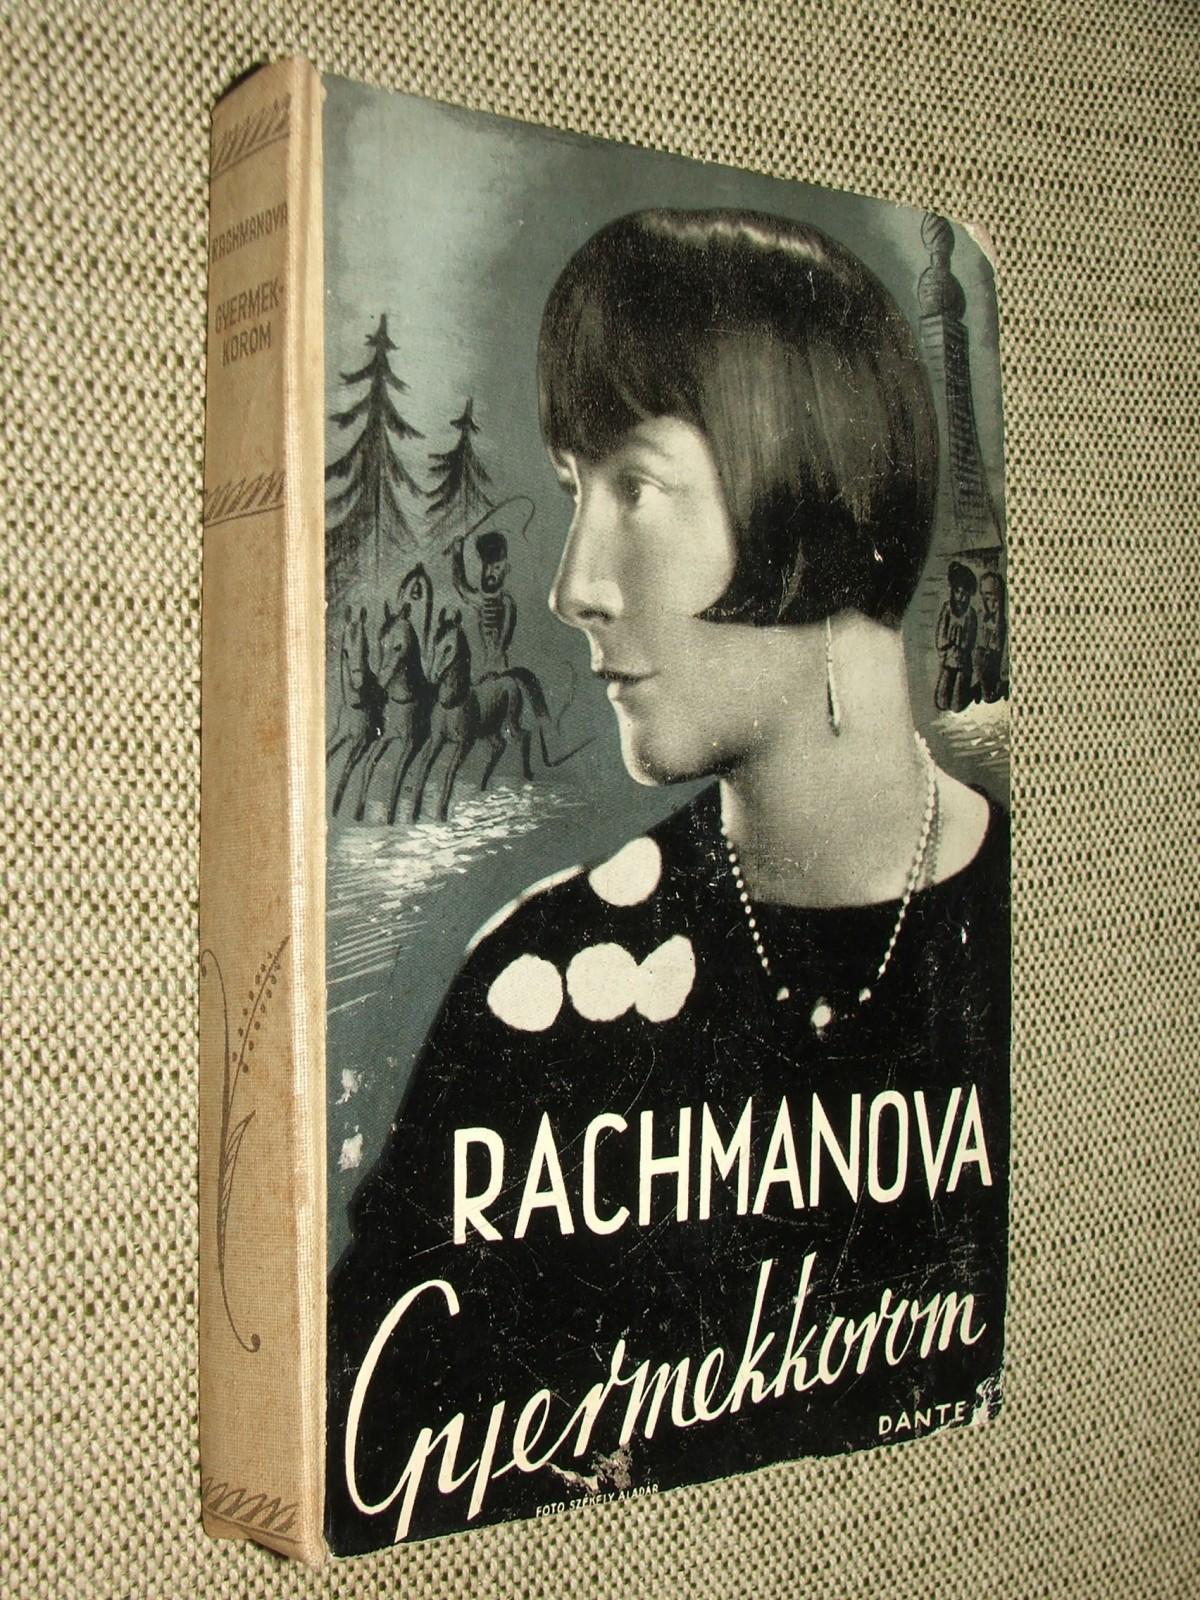 RACHMANOVA, Alexandra: Gyermekkorom